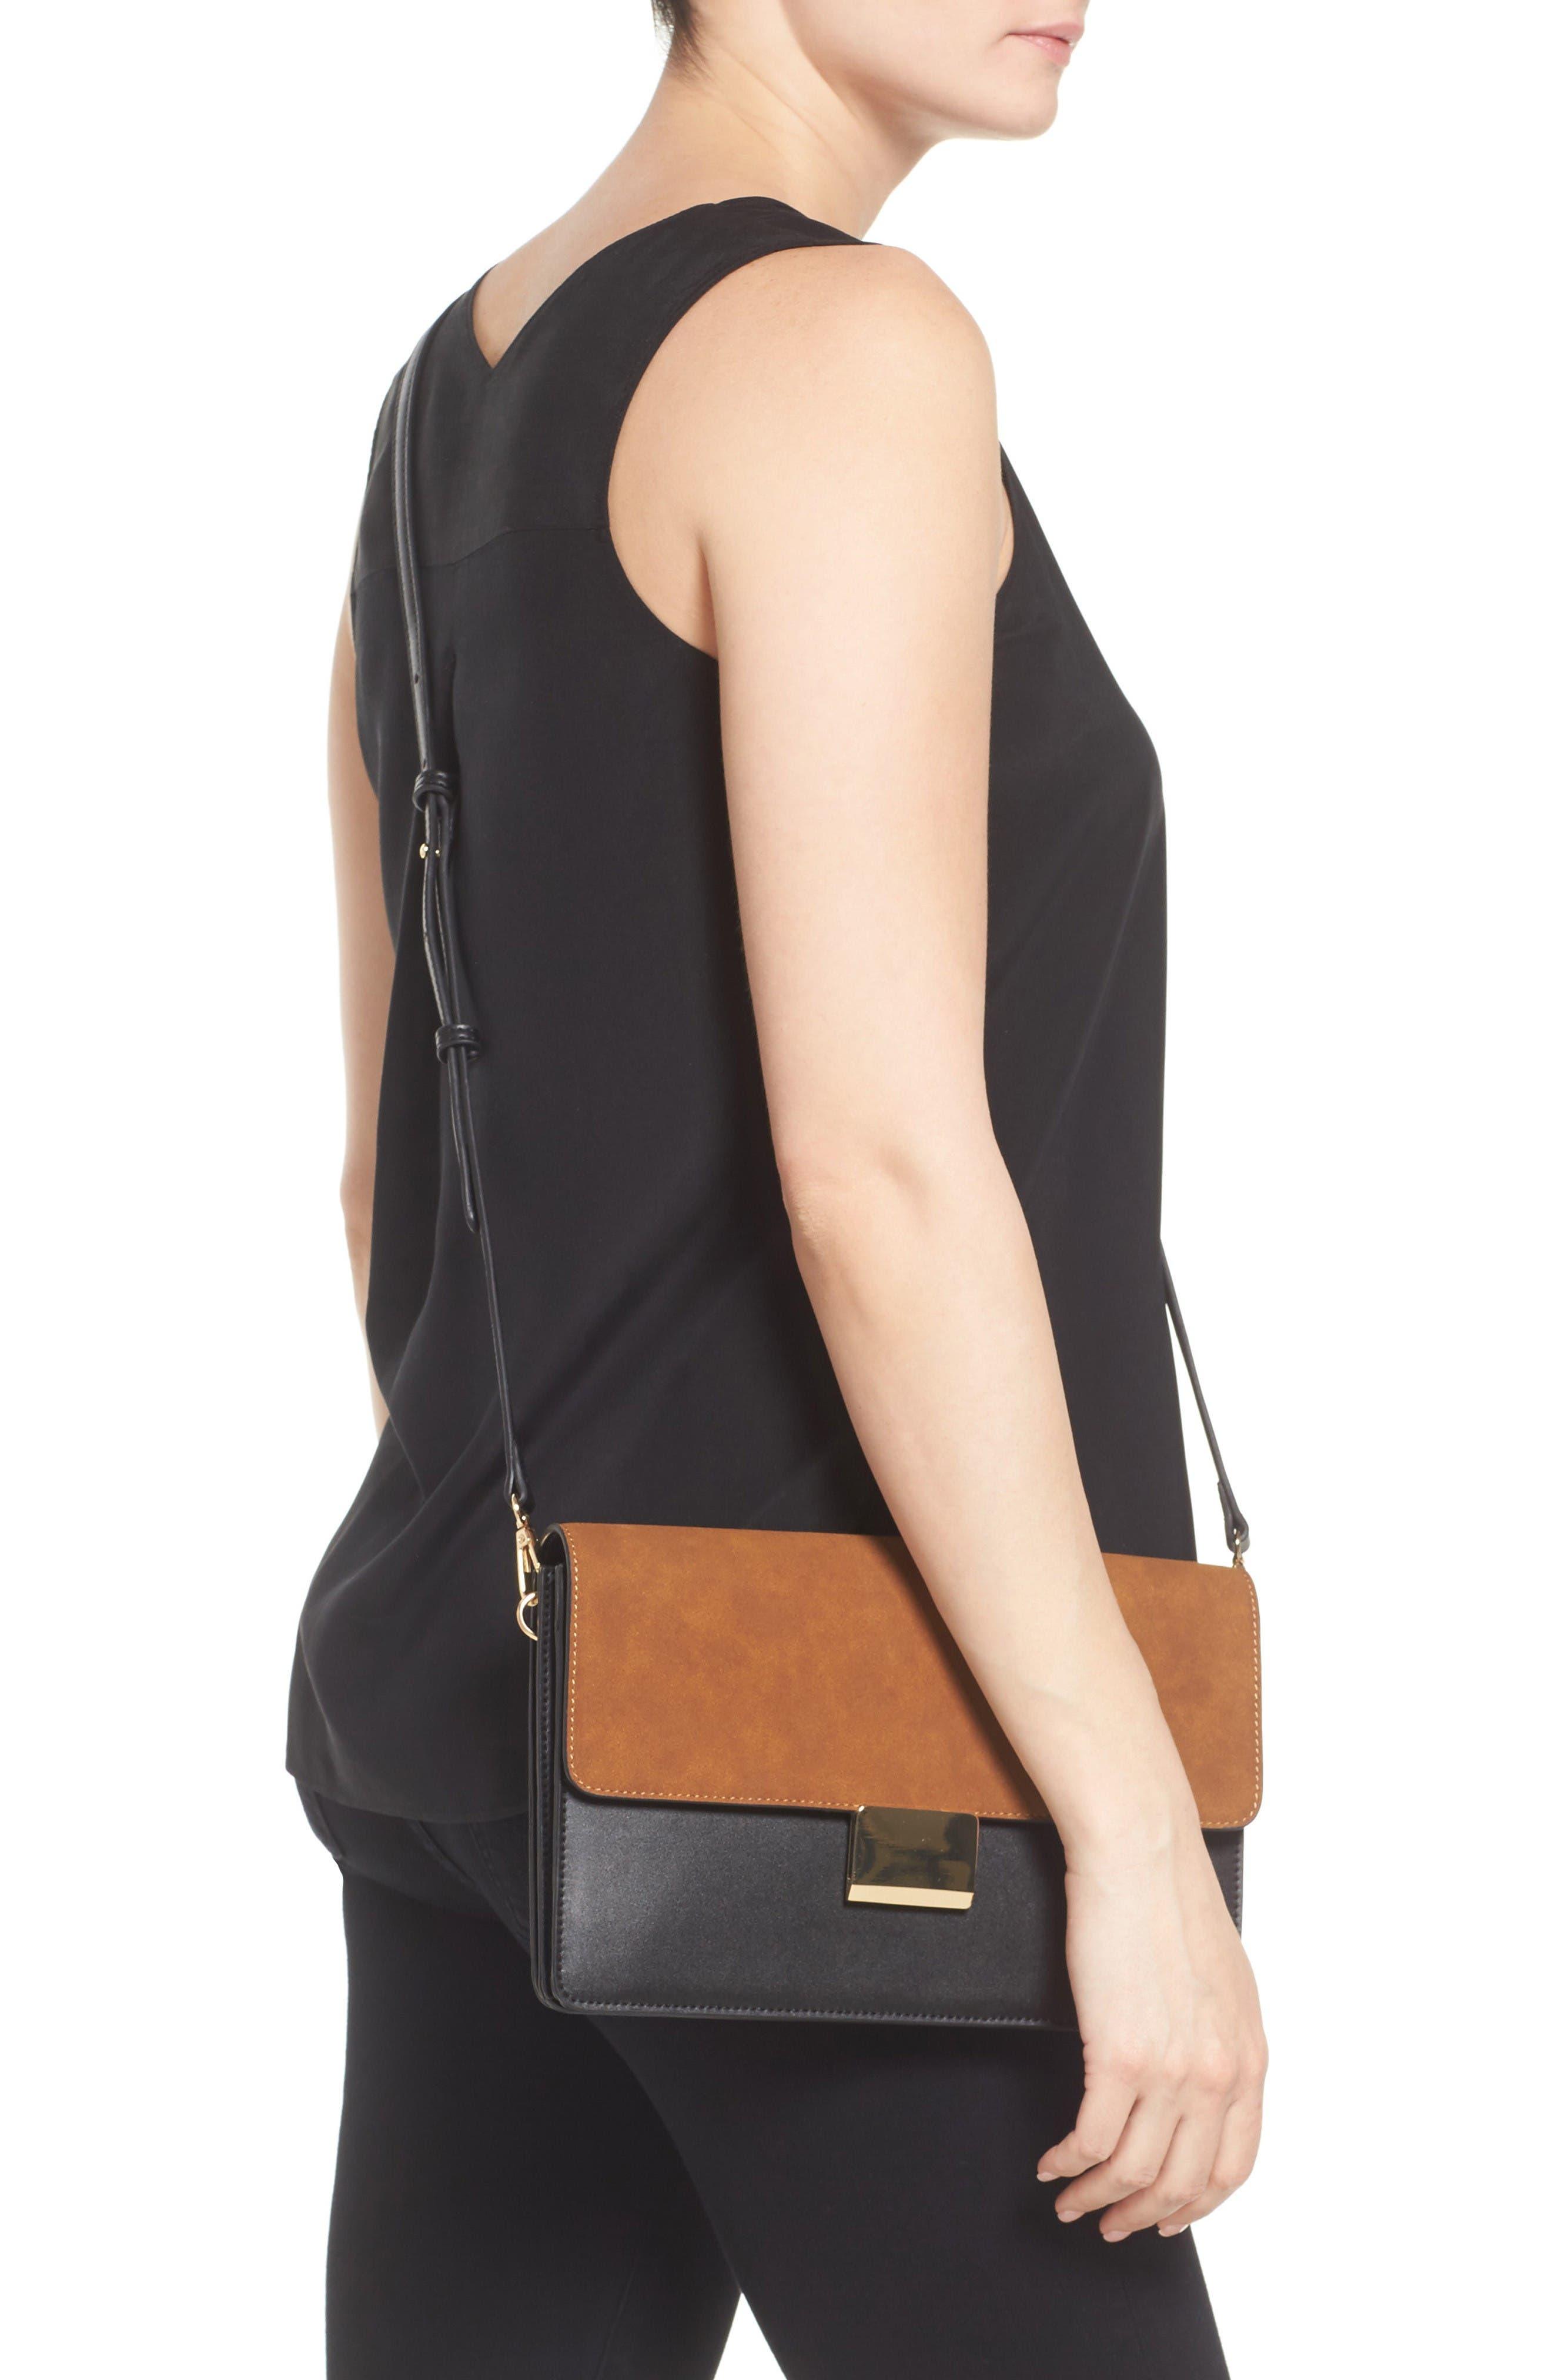 Leighton Colorblock Faux Leather Crossbody Bag,                             Alternate thumbnail 2, color,                             Black/Cognac